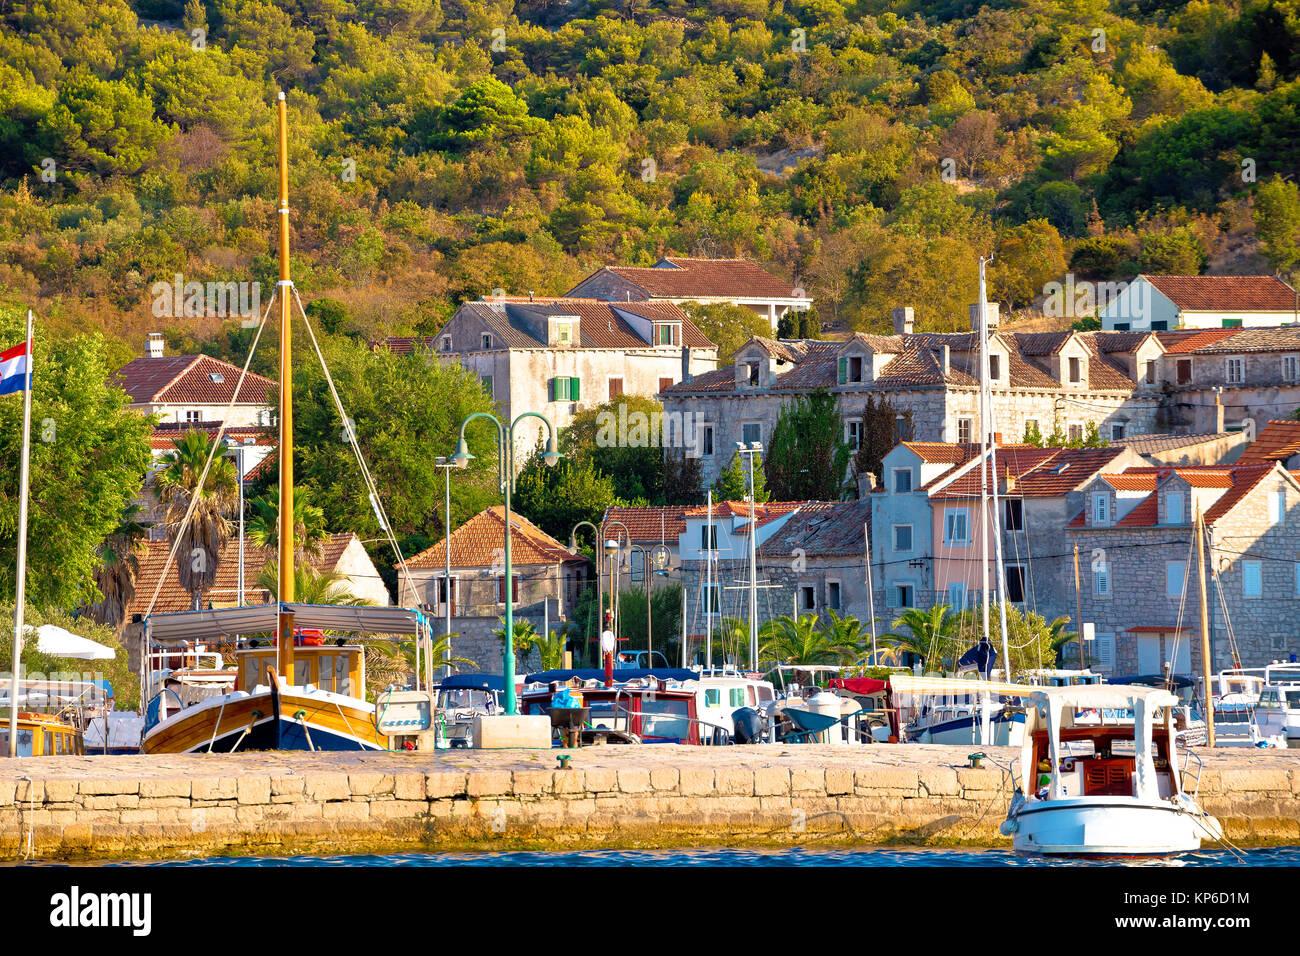 Bunte Hafen Zlarin Insel Archipel von Sibenik, Kroatien Stockbild